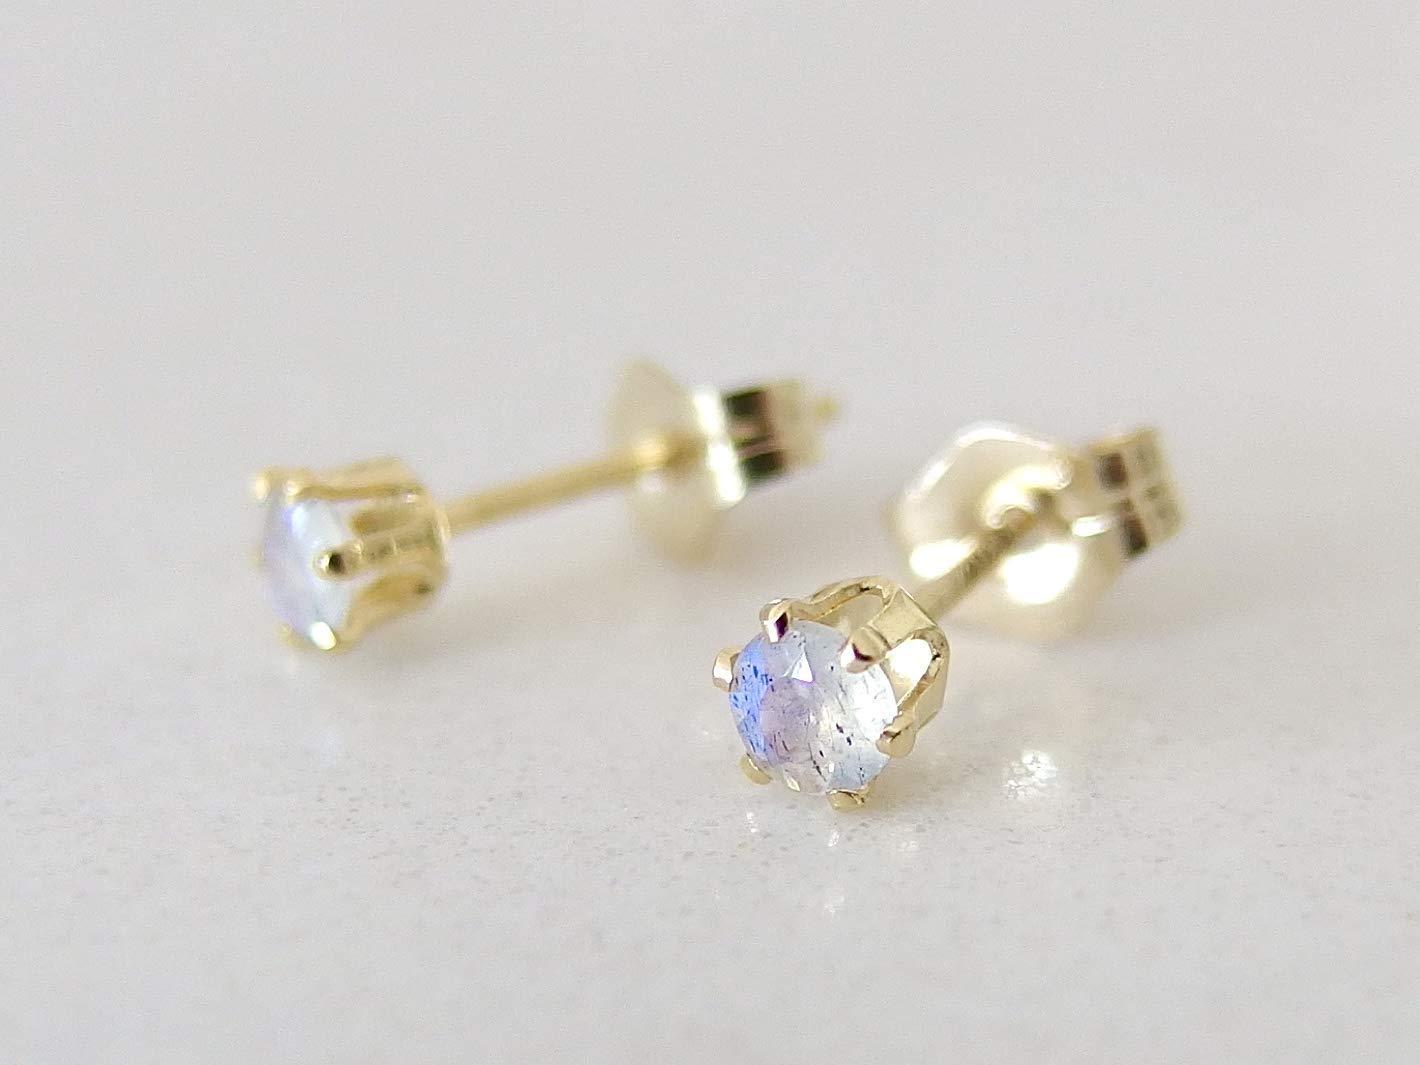 Gold-Filled 5mm Labradorite Earrings for Women Labradorite Earrings Studs Tiny Gemstone Stud Earrings